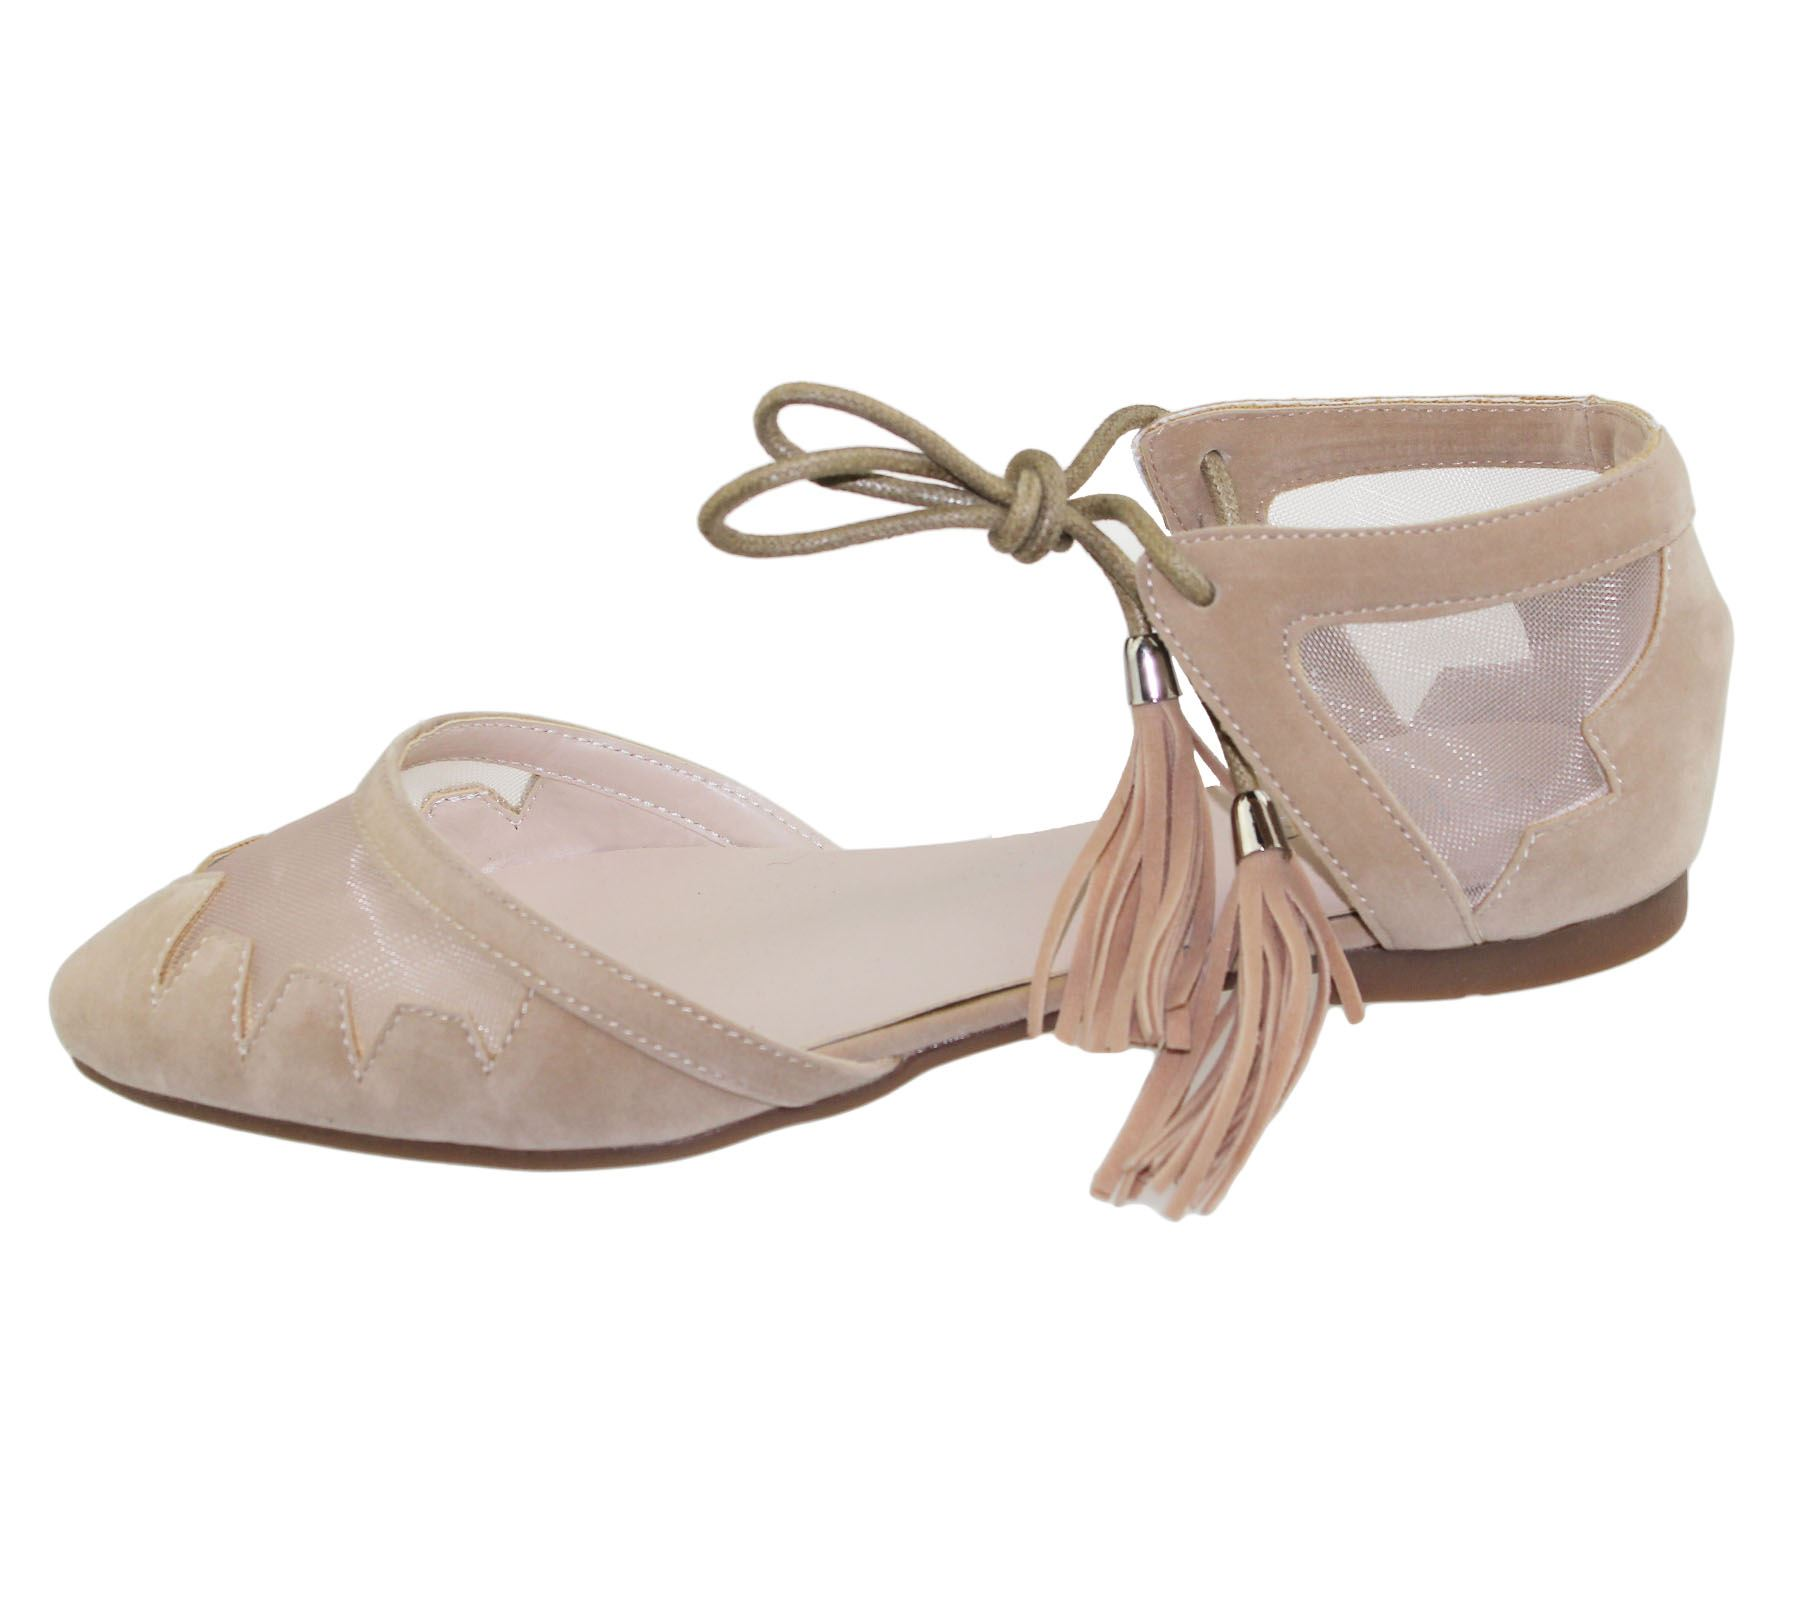 Womens-Flat-Ballerina-Dolly-Pumps-Ballet-Ladies-Summer-Mesh-Tassel-Shoes-Sandals thumbnail 12